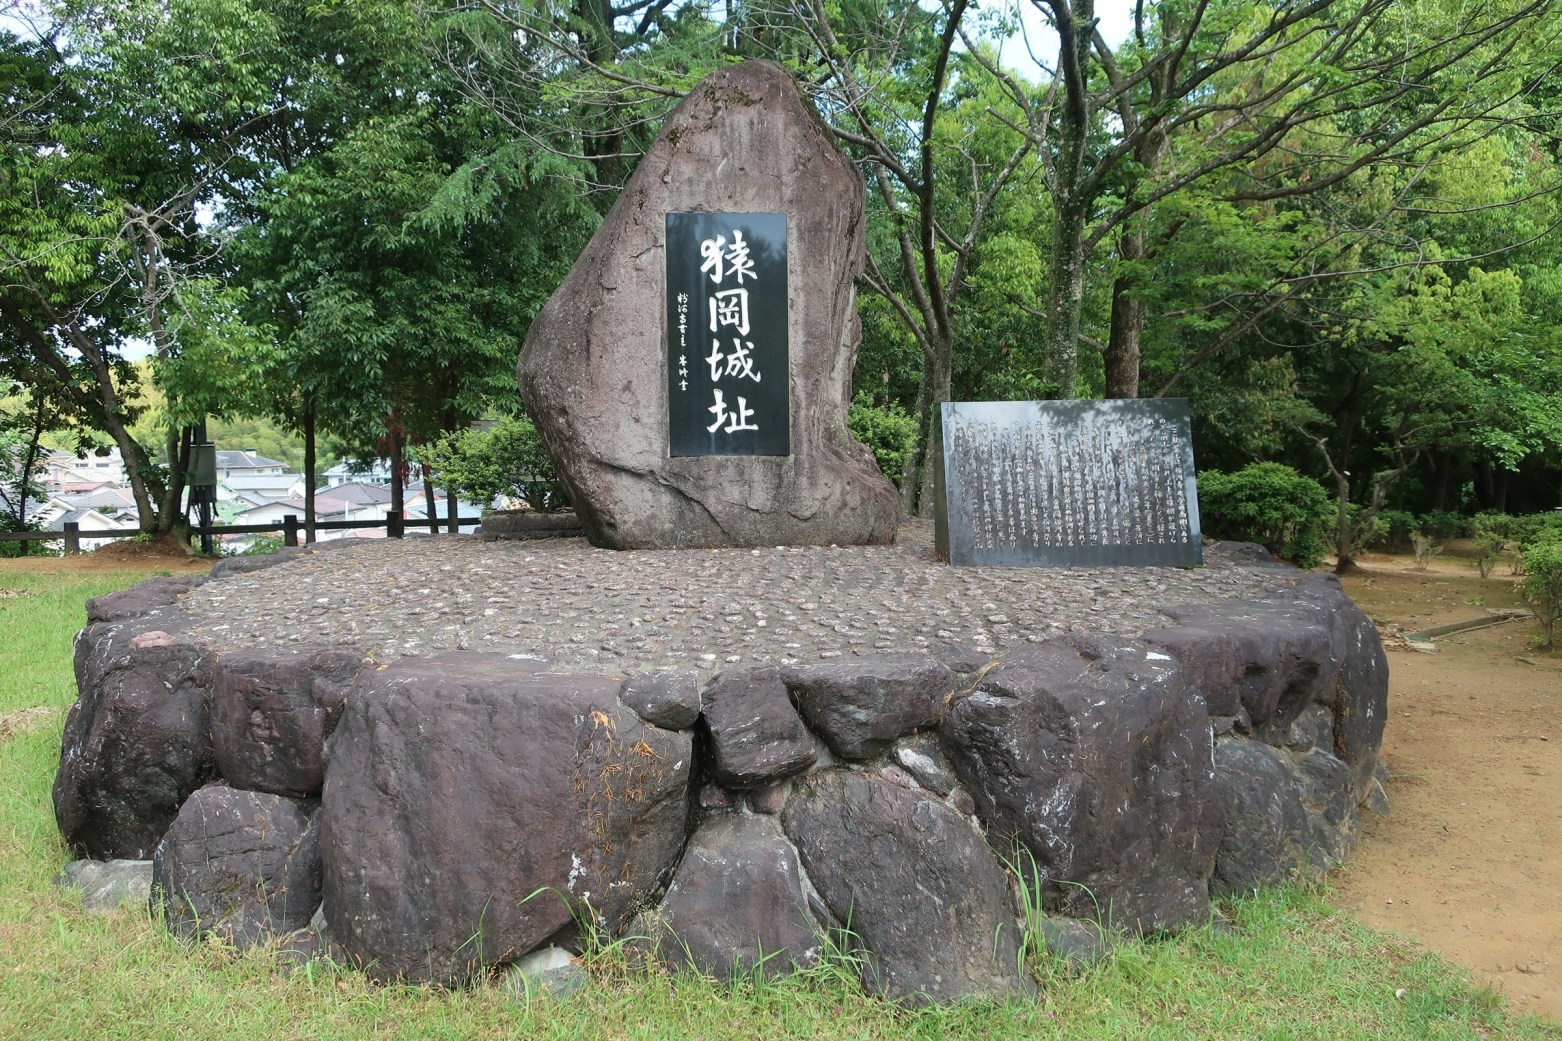 二之曲輪の城址碑